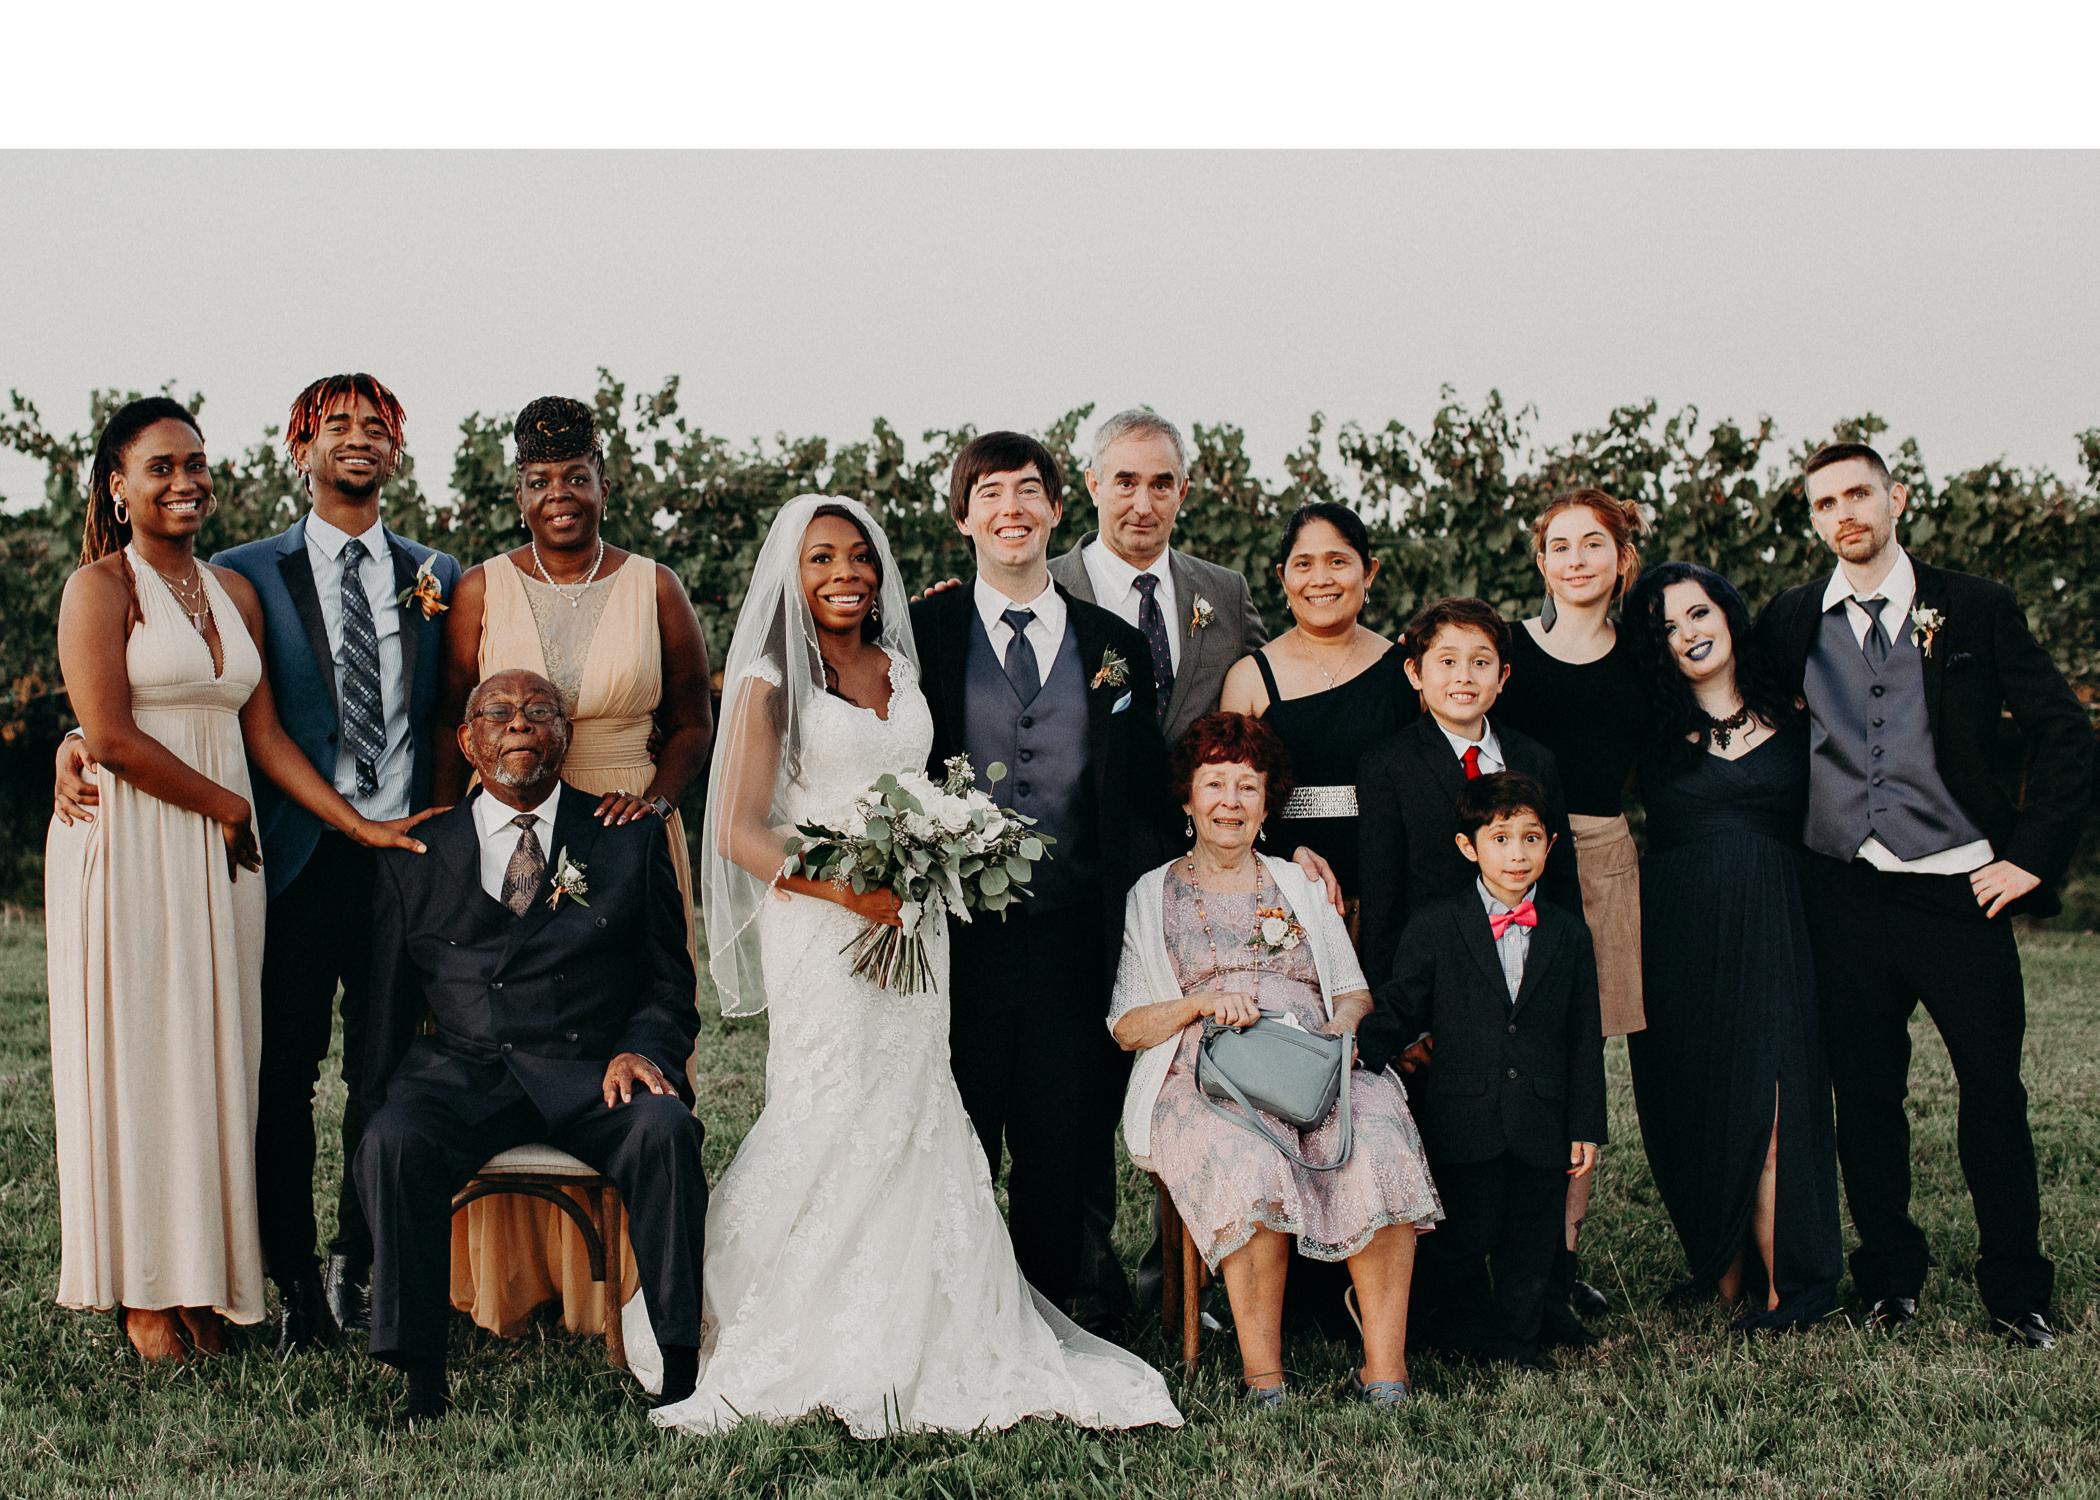 83- Kaya_vineyard_dahlonega_wedding_venue_aline_marin_photography.jpg